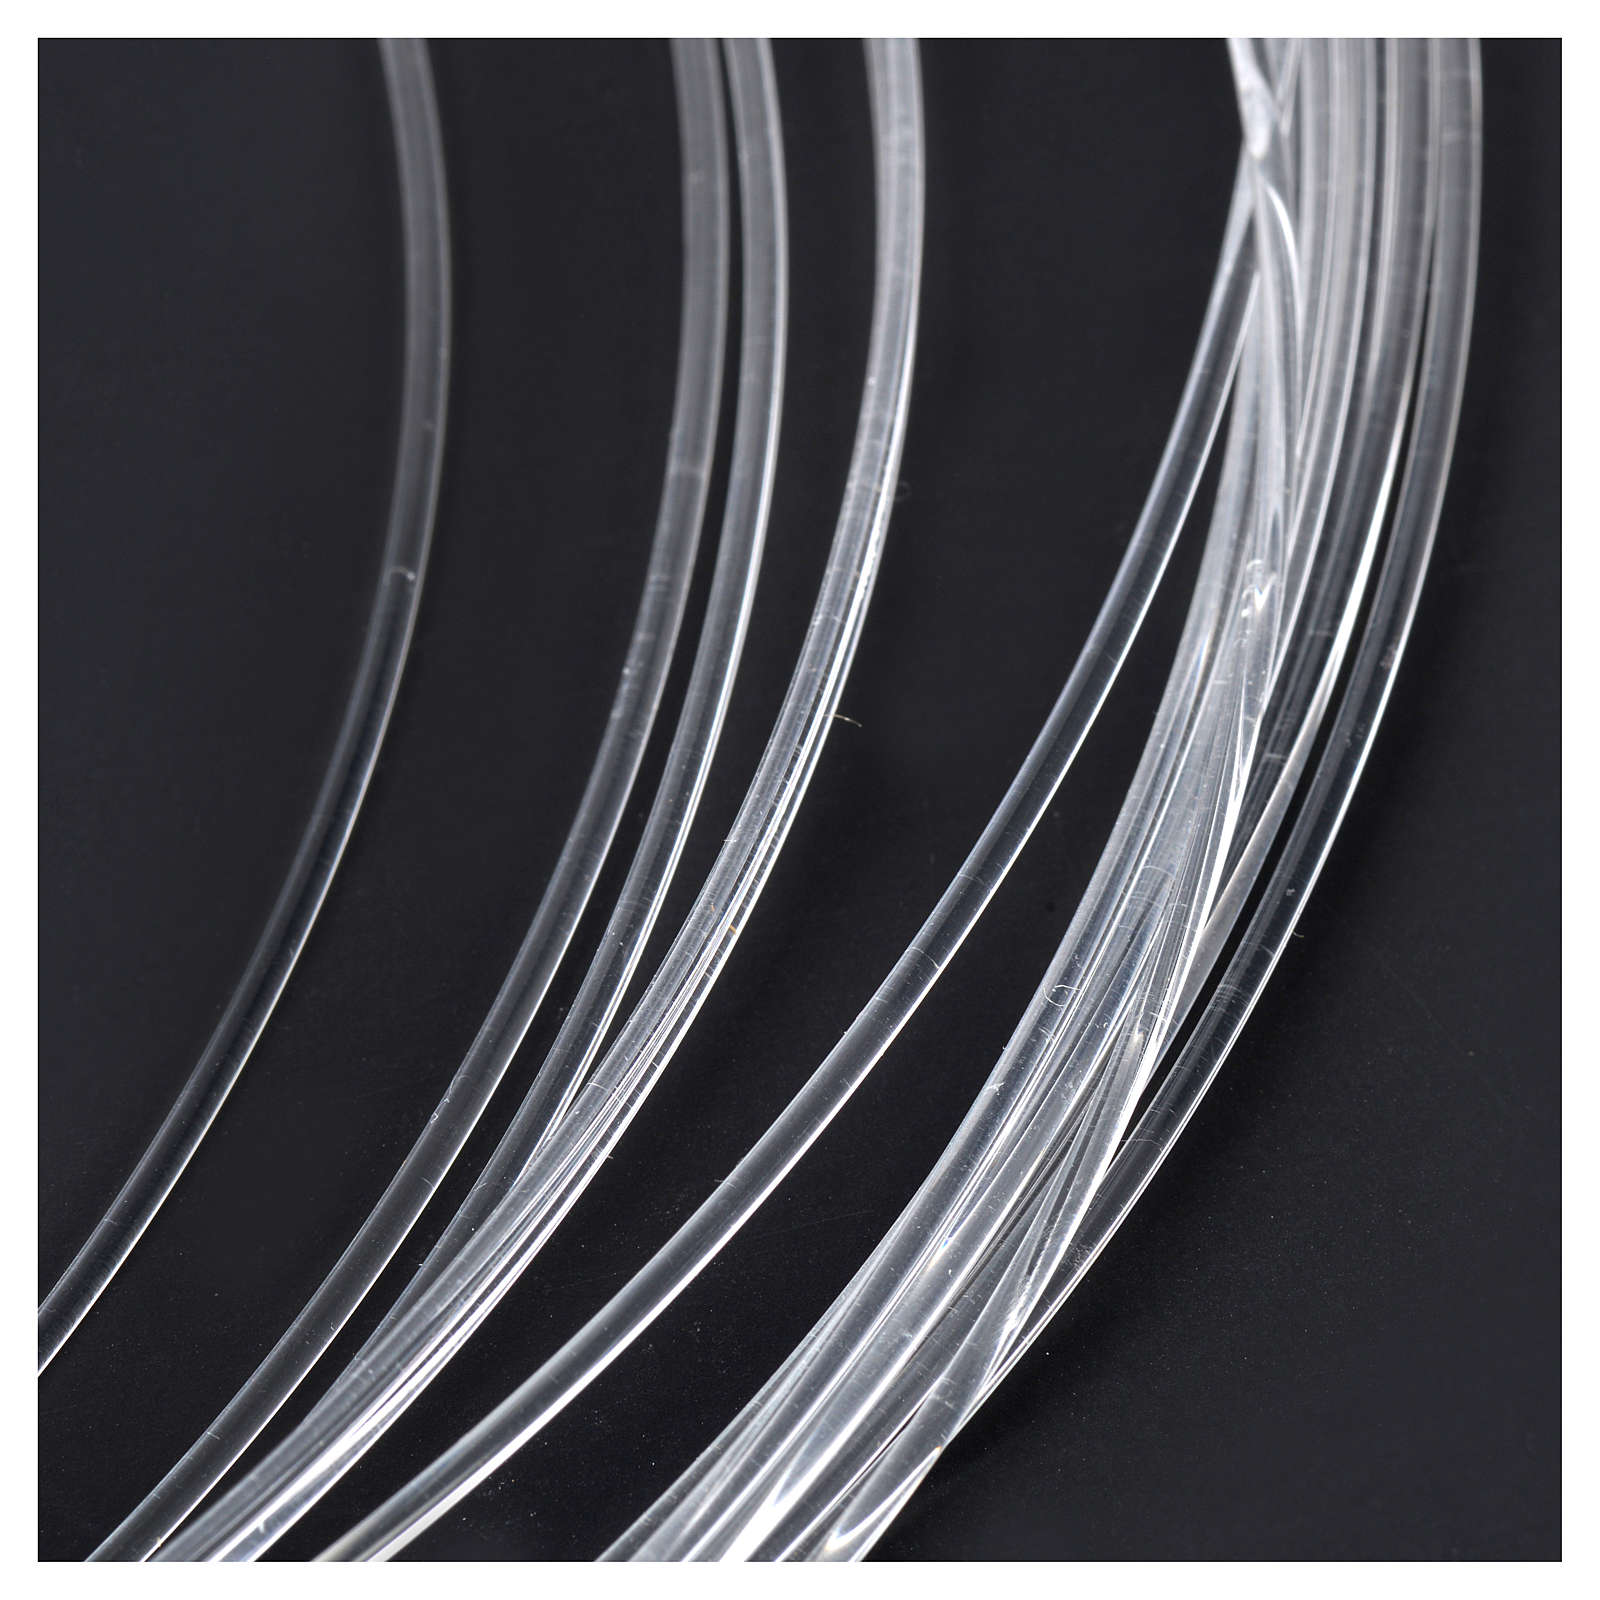 Bobina fibra ottica 10 mt per presepe - diam 0,75 mm 4